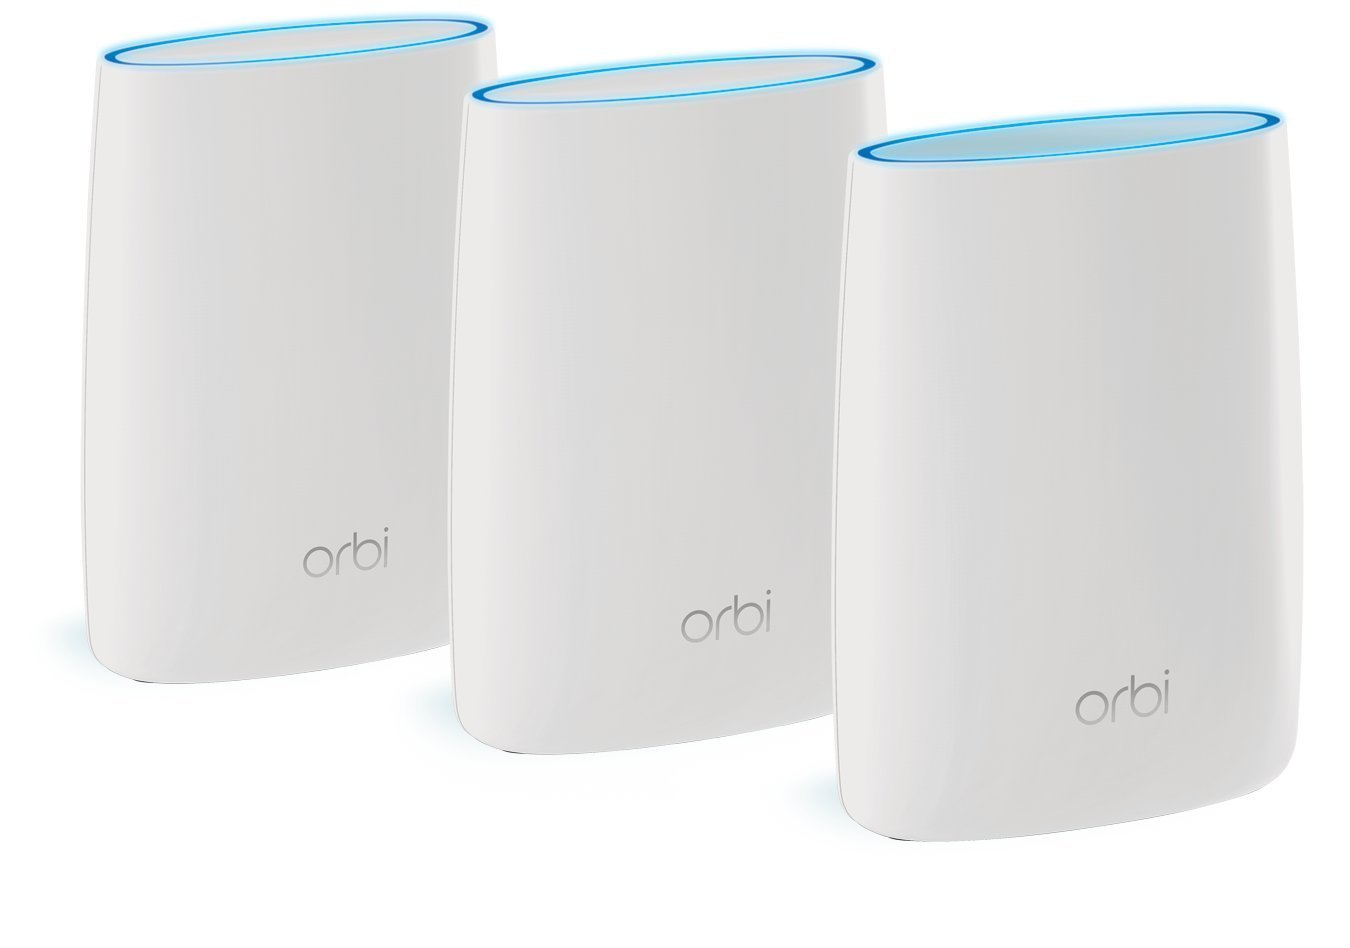 Netgear Orbi AC3000 Tri-Band WiFi System Router + 2 Satellite, RBK53